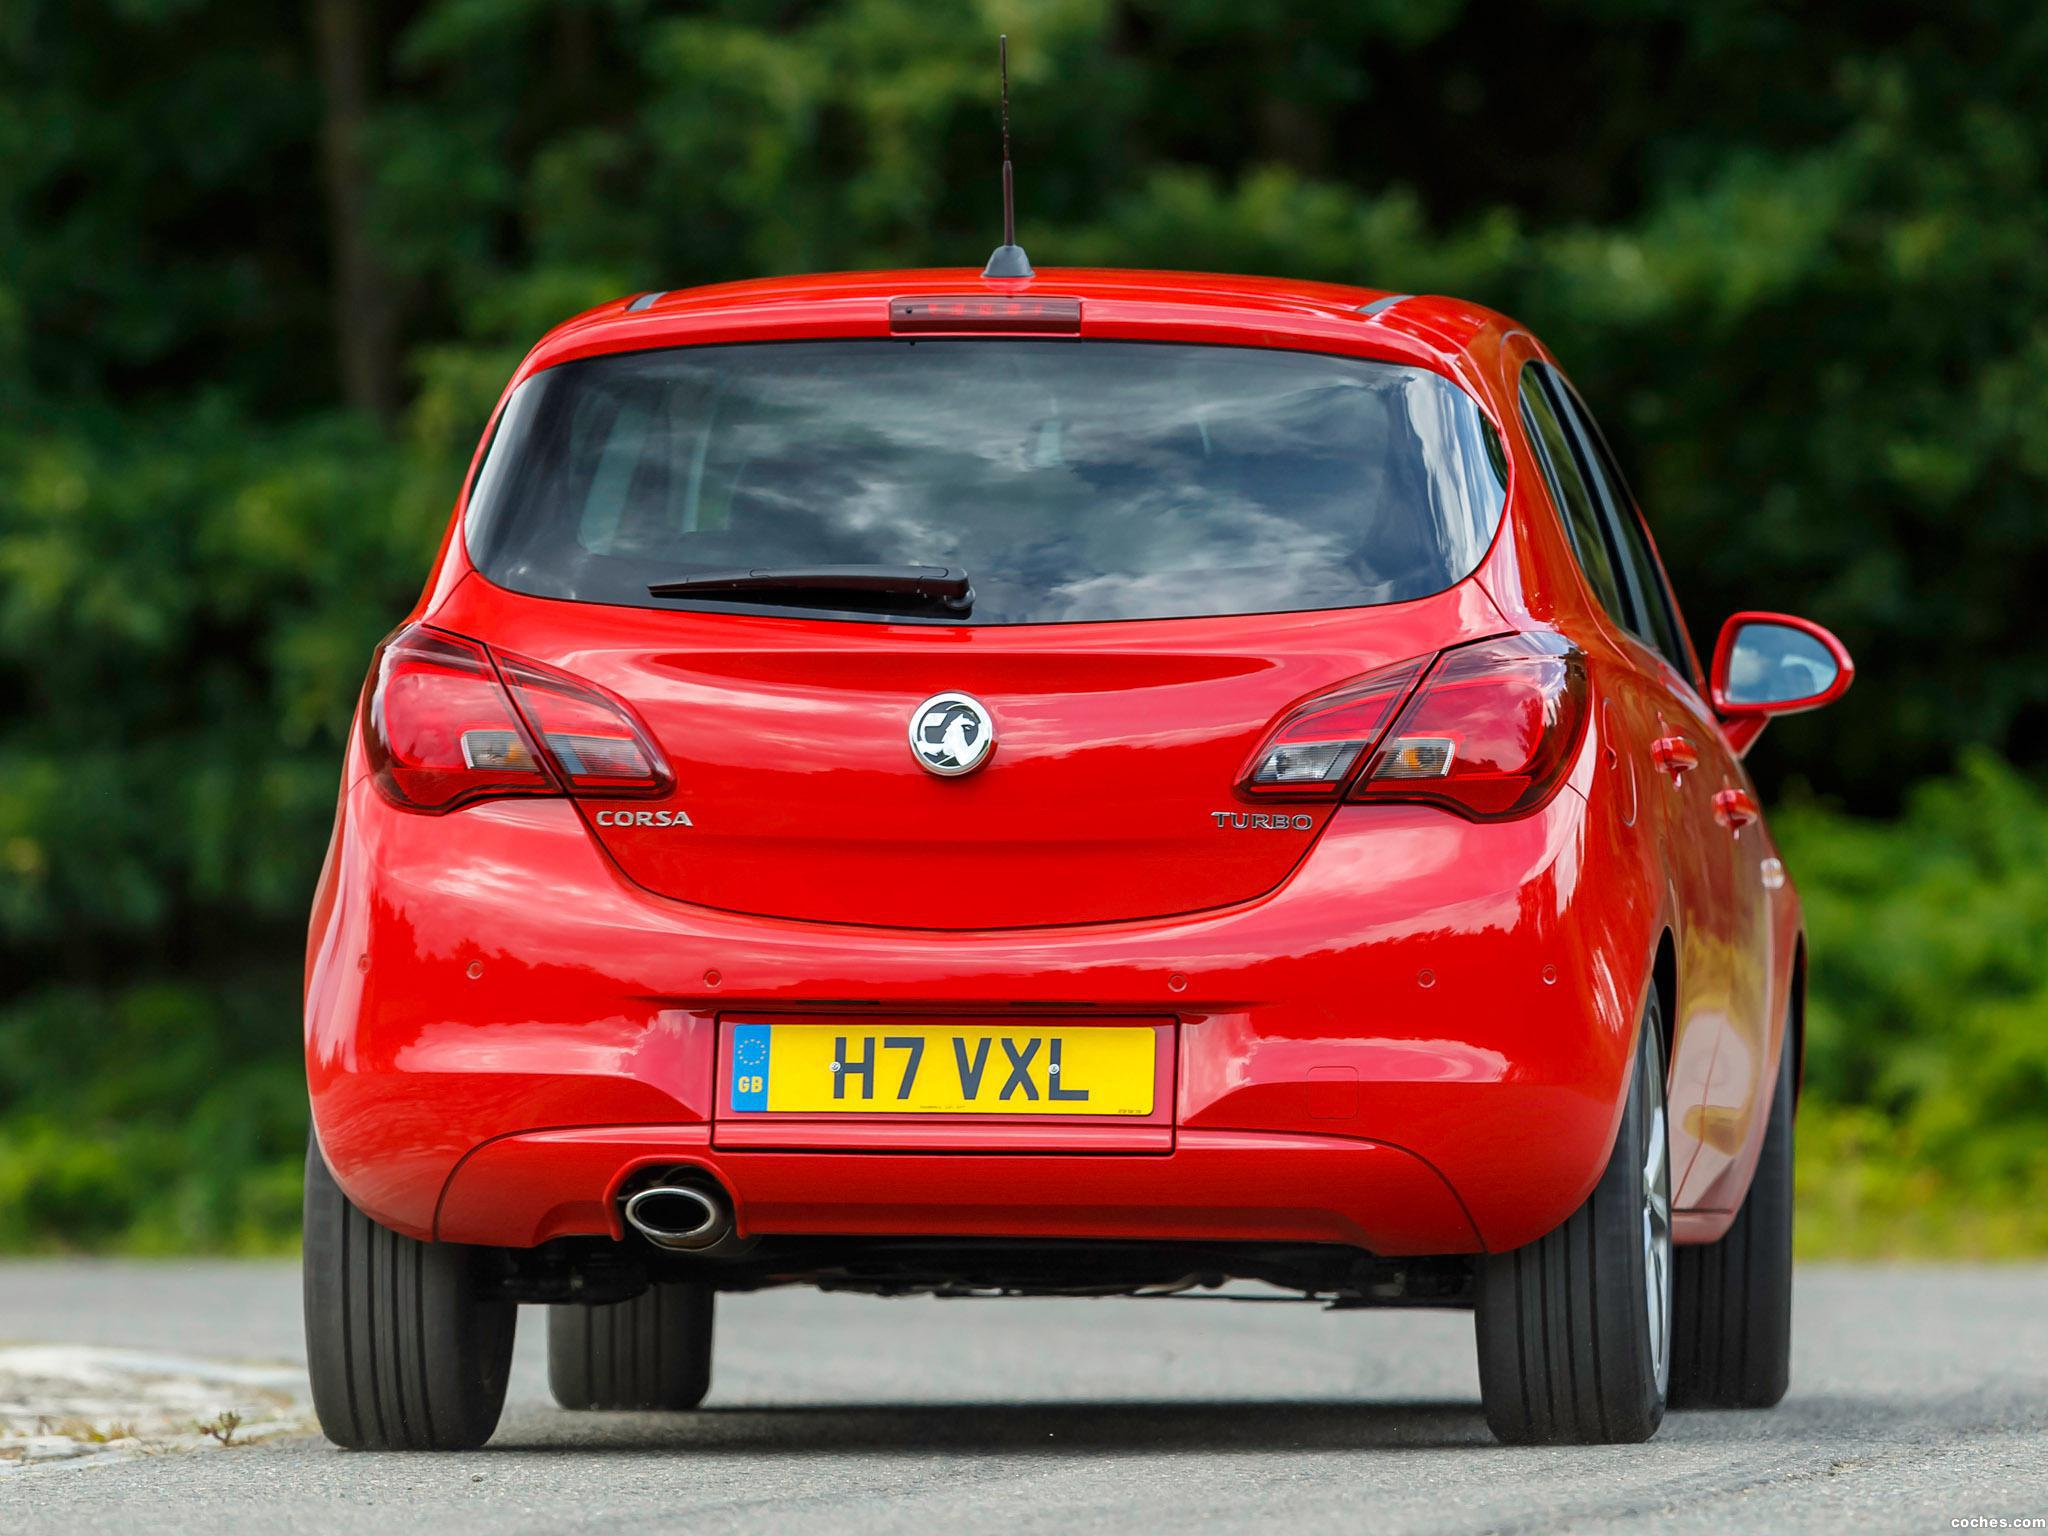 Foto 5 de Vauxhall Corsa 5 puertas 2014